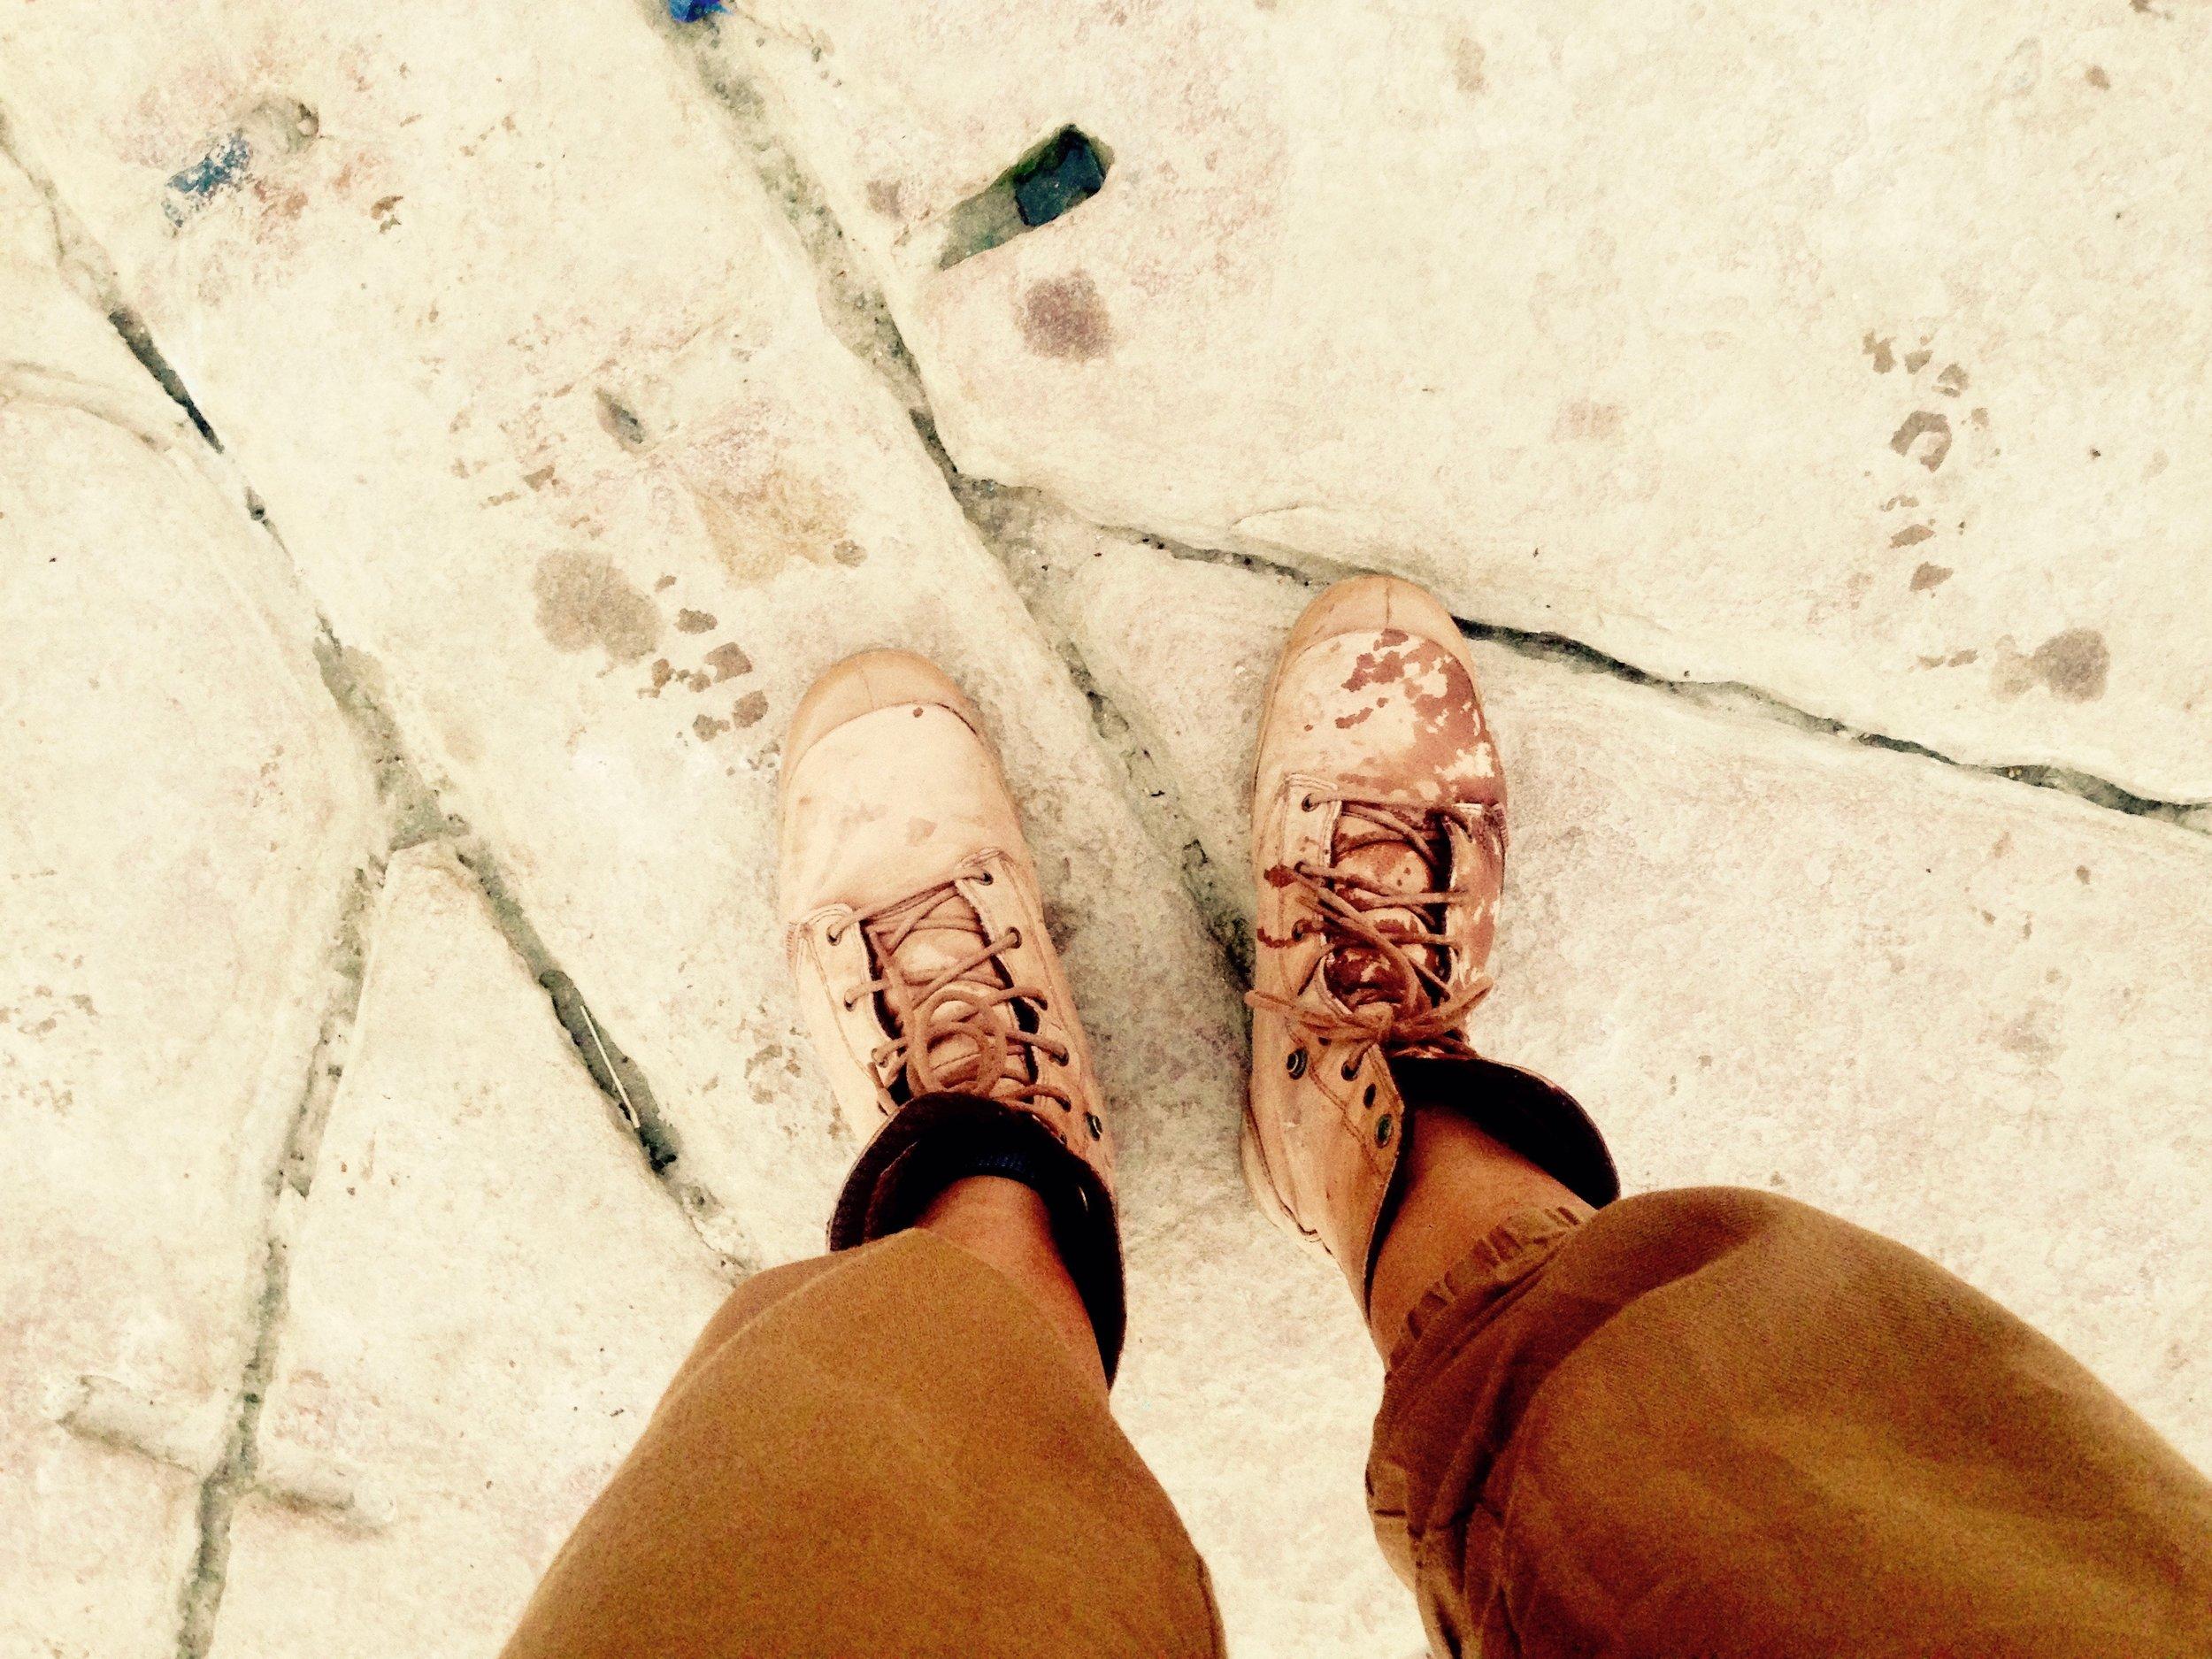 Got Ganges water on my shoe